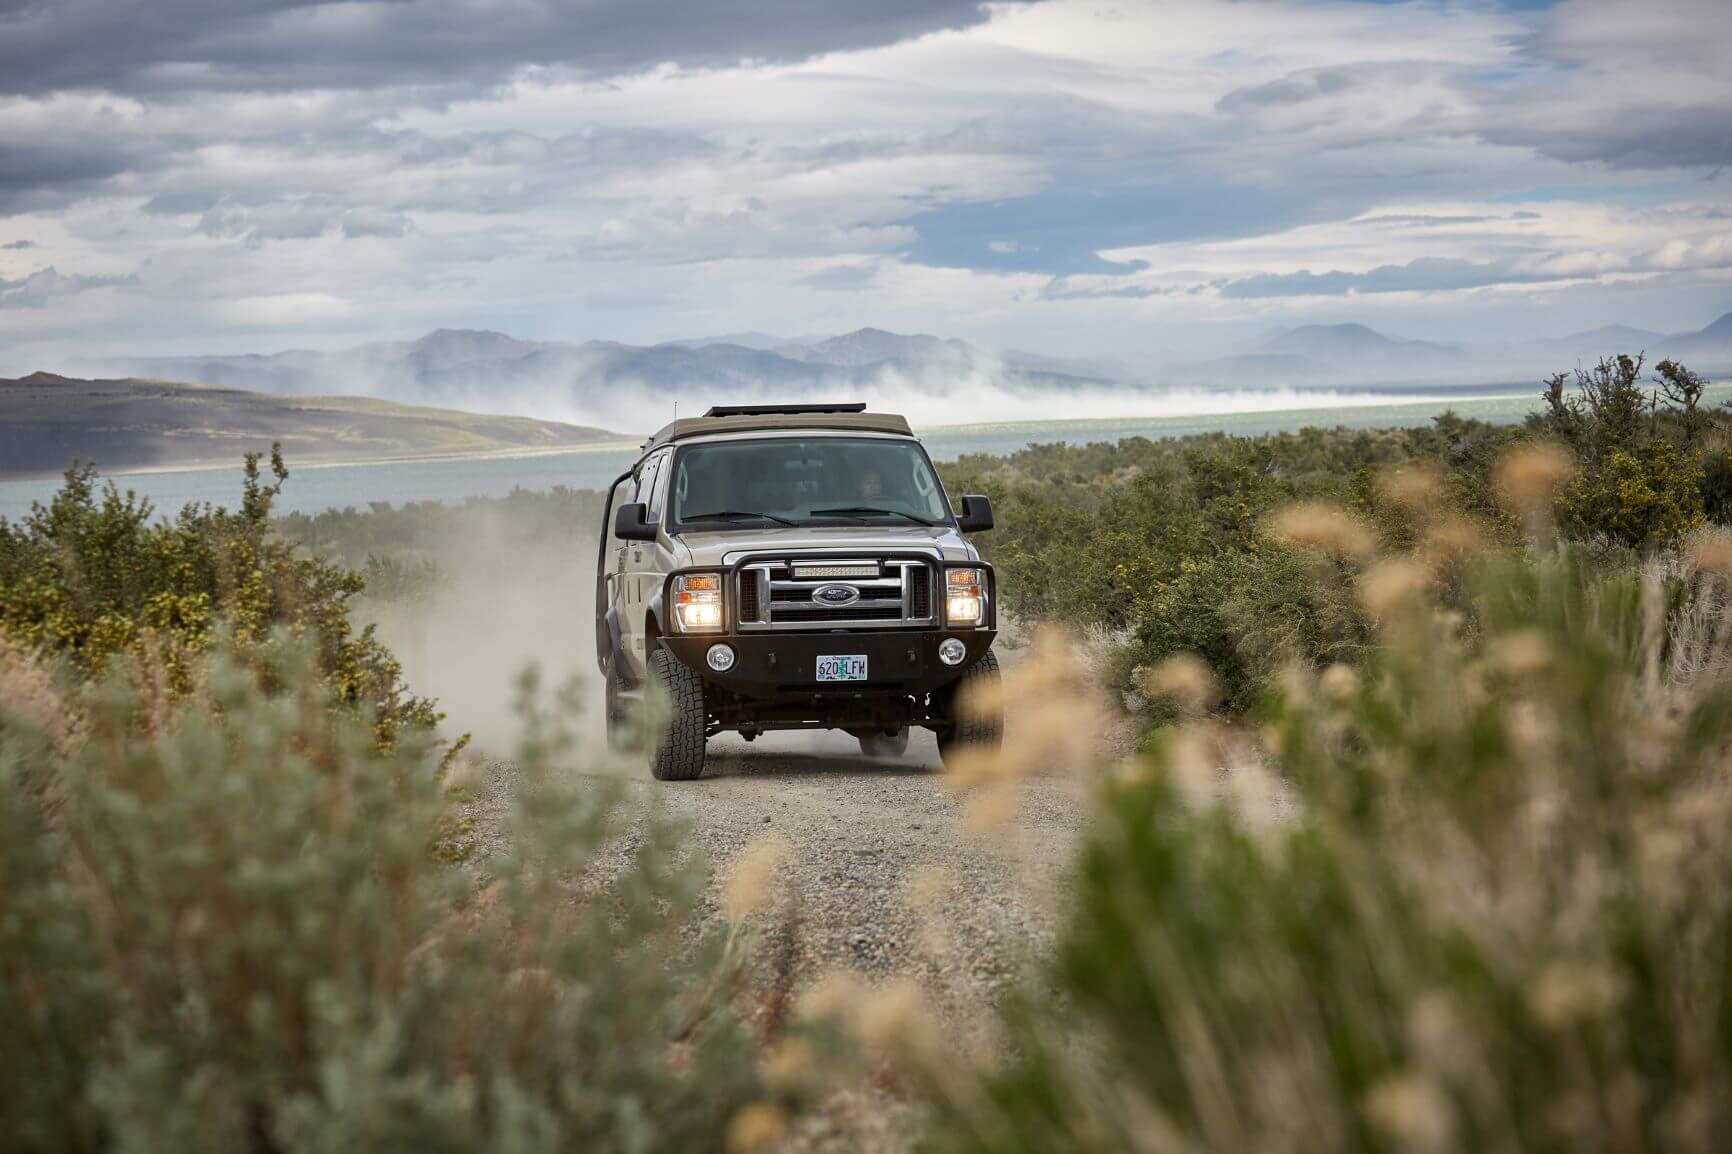 4x4 off-road adventure in a ROAMERICA campervan